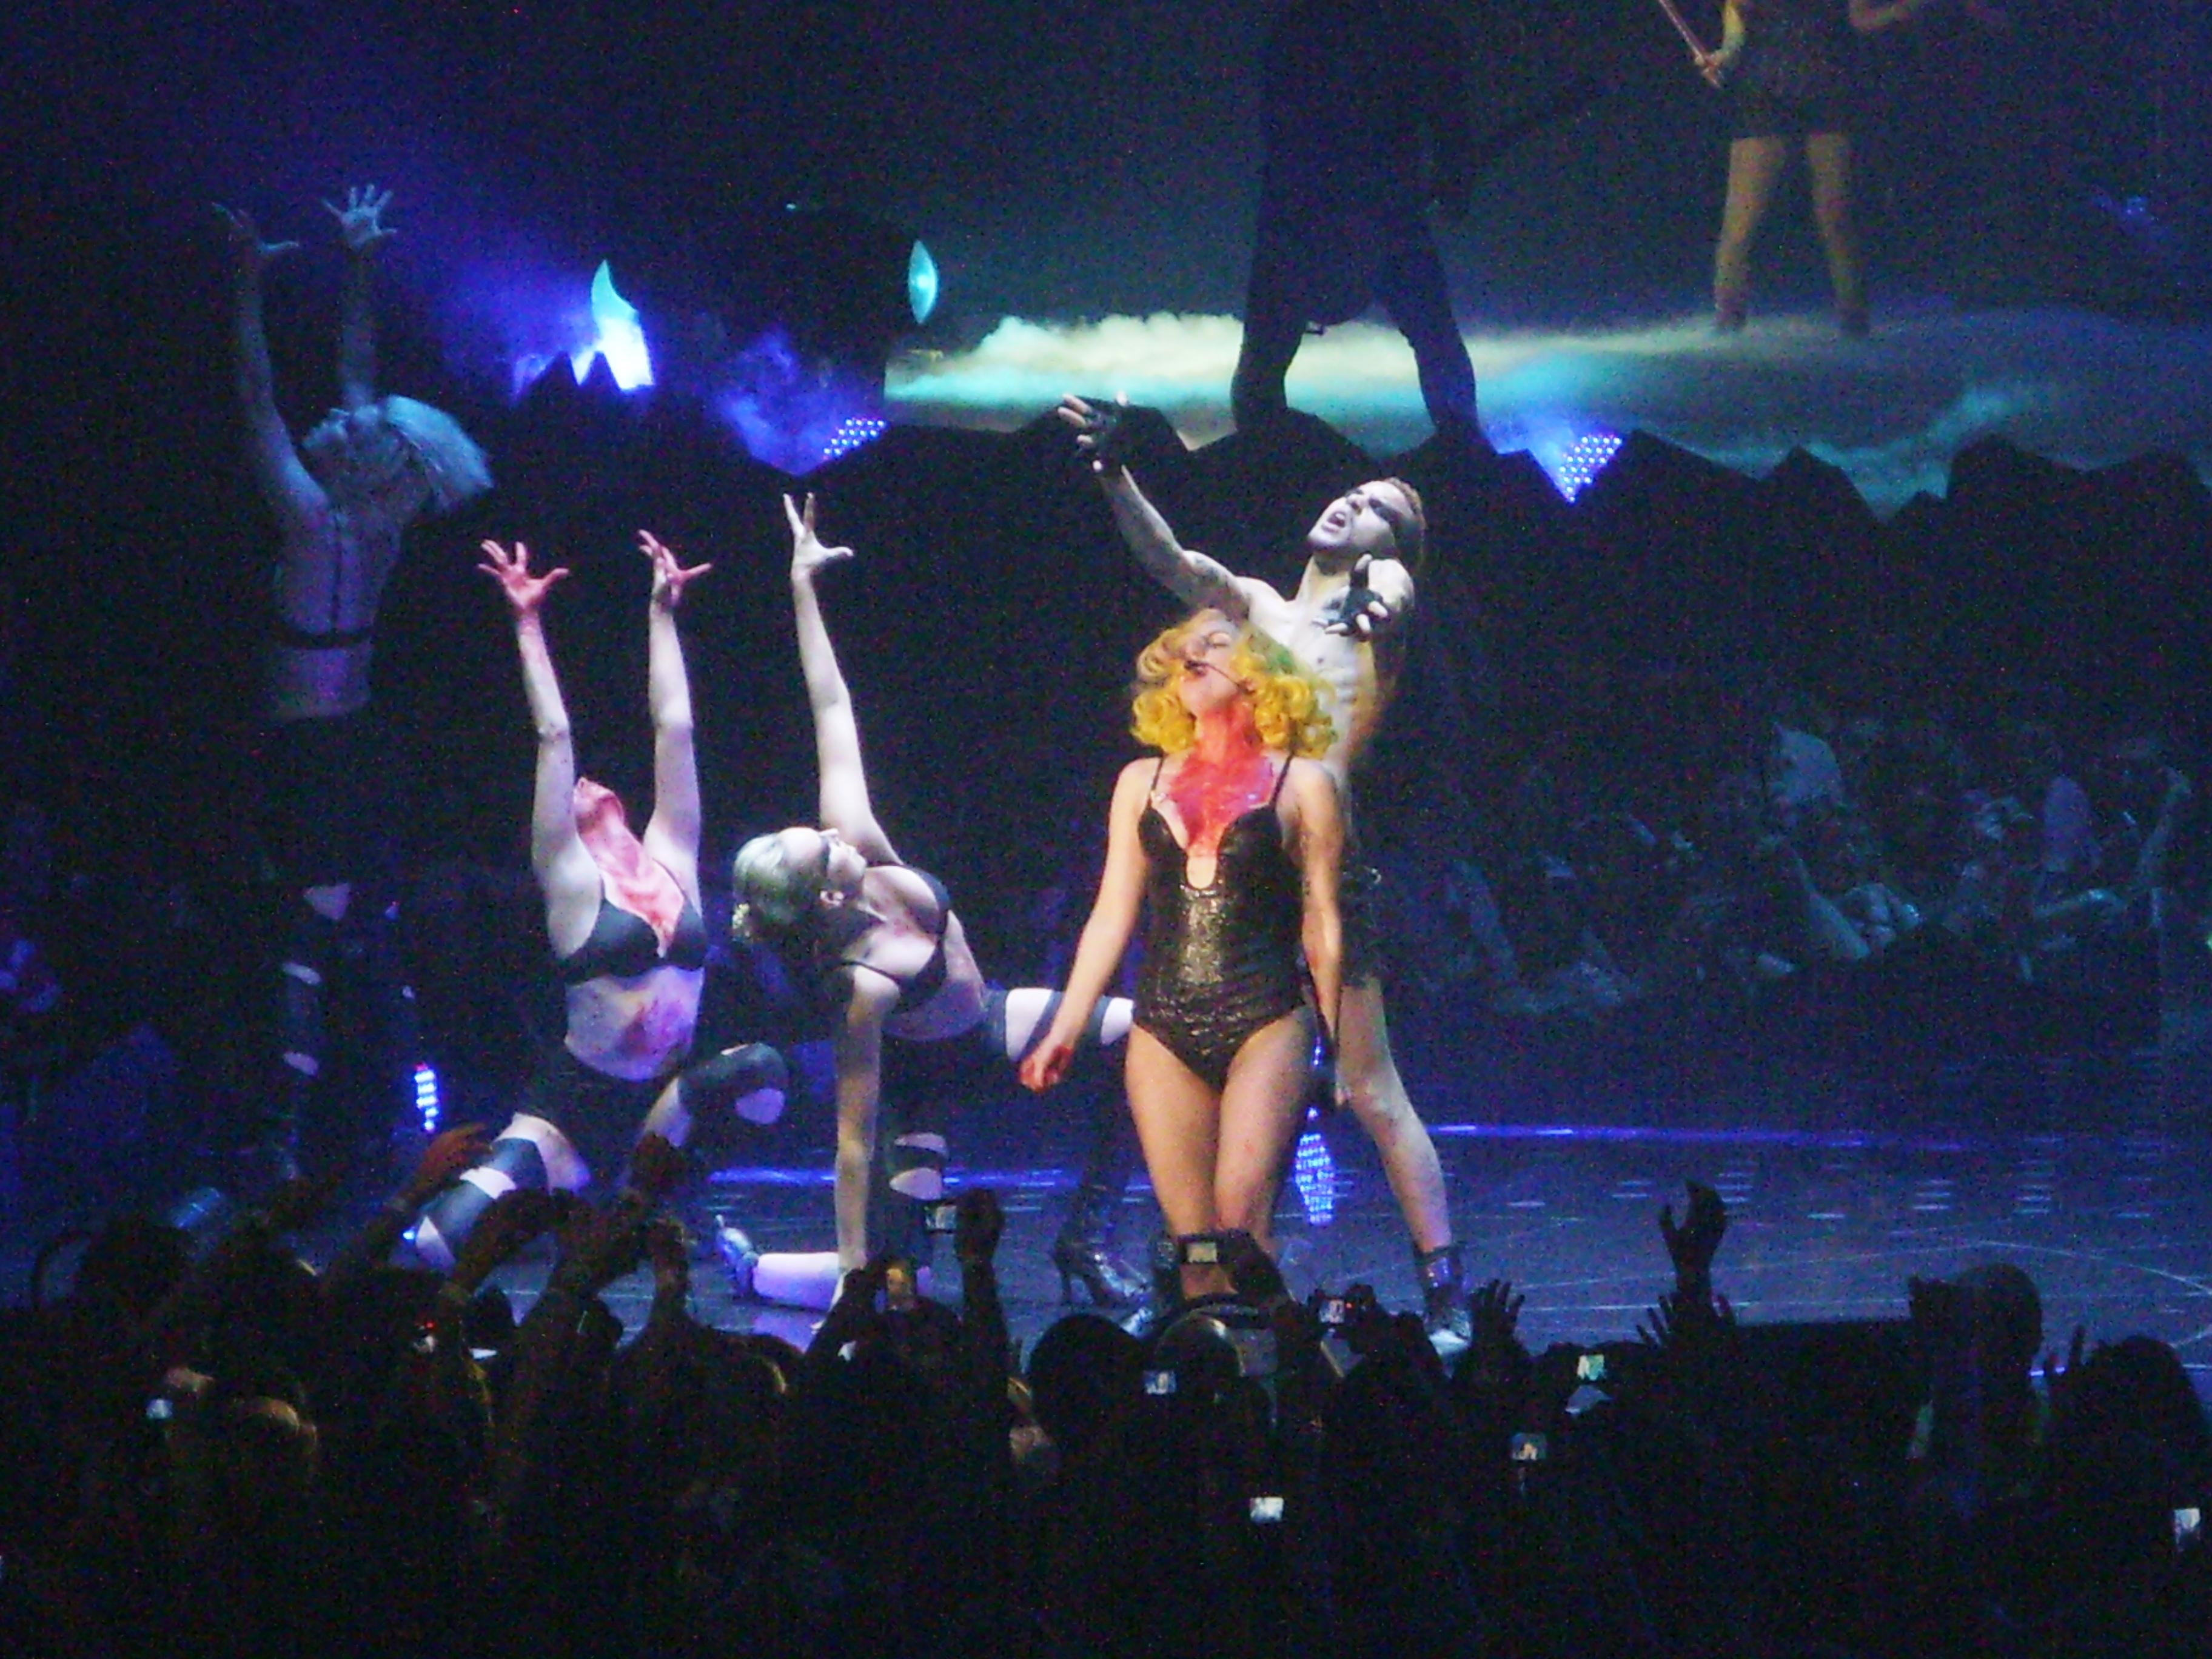 tattoos adorning Lady Gaga